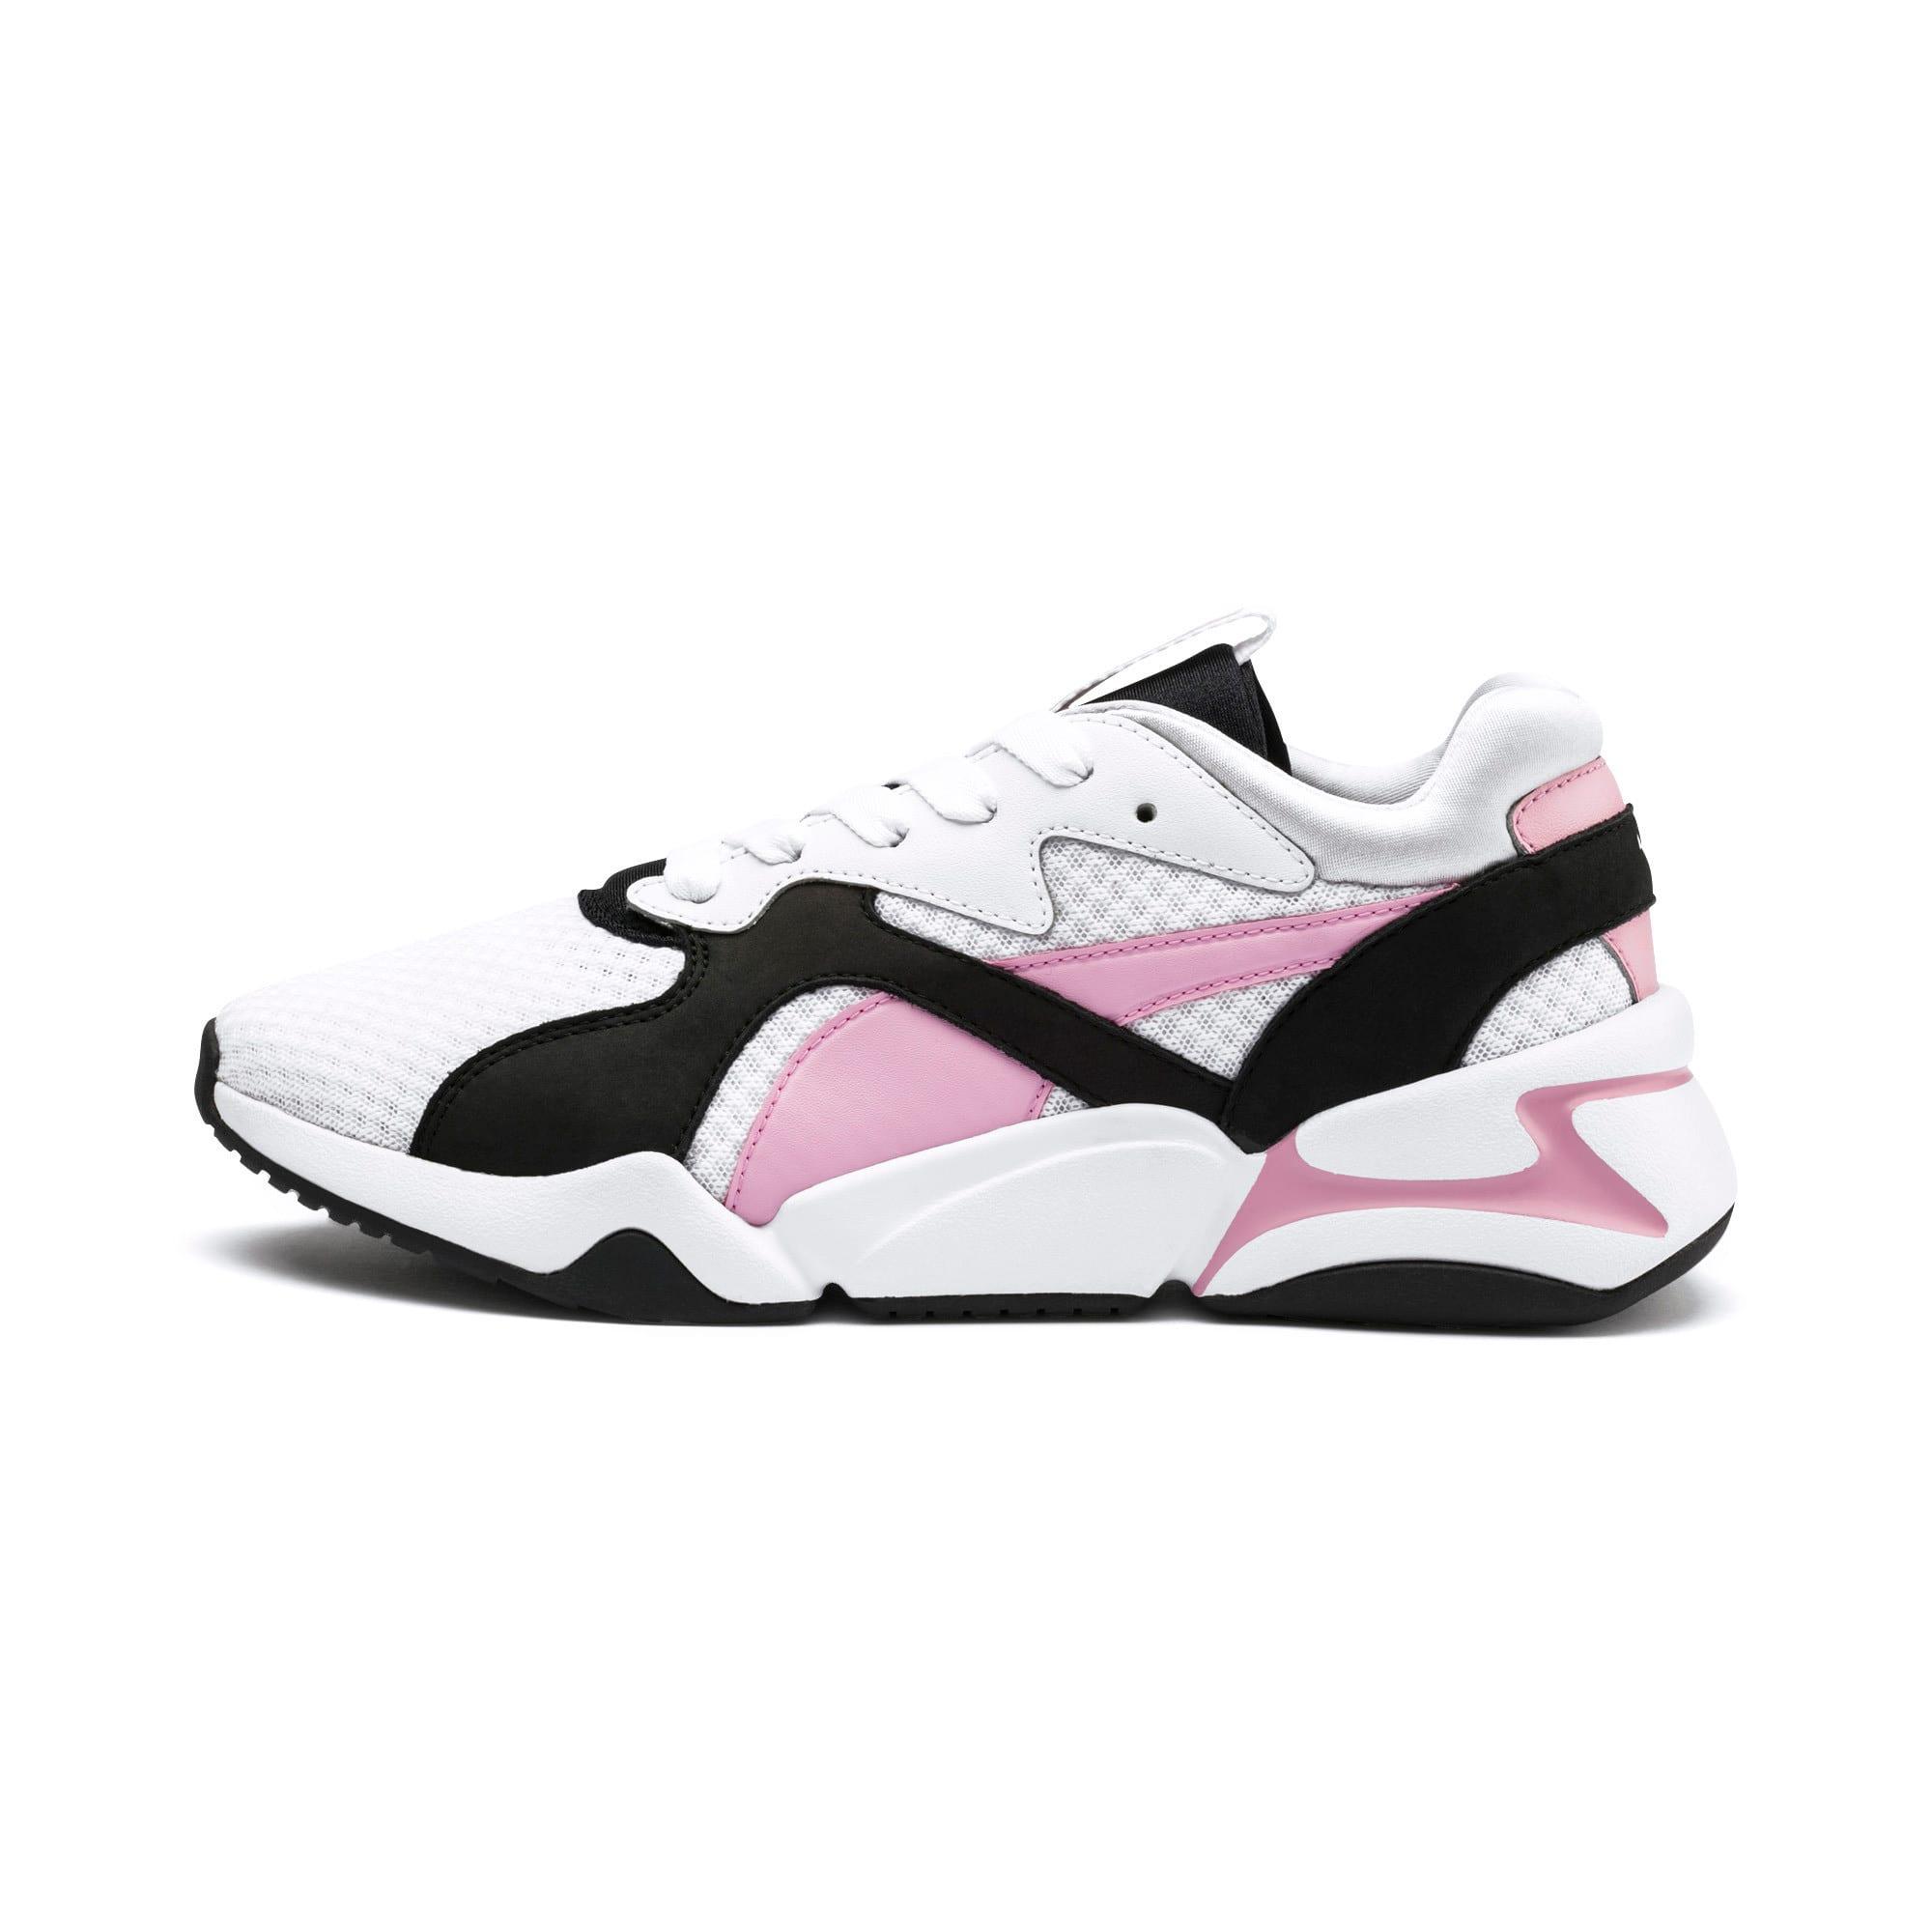 Thumbnail 1 of Nova '90s Bloc Women's Sneakers, Puma White-Pale Pink, medium